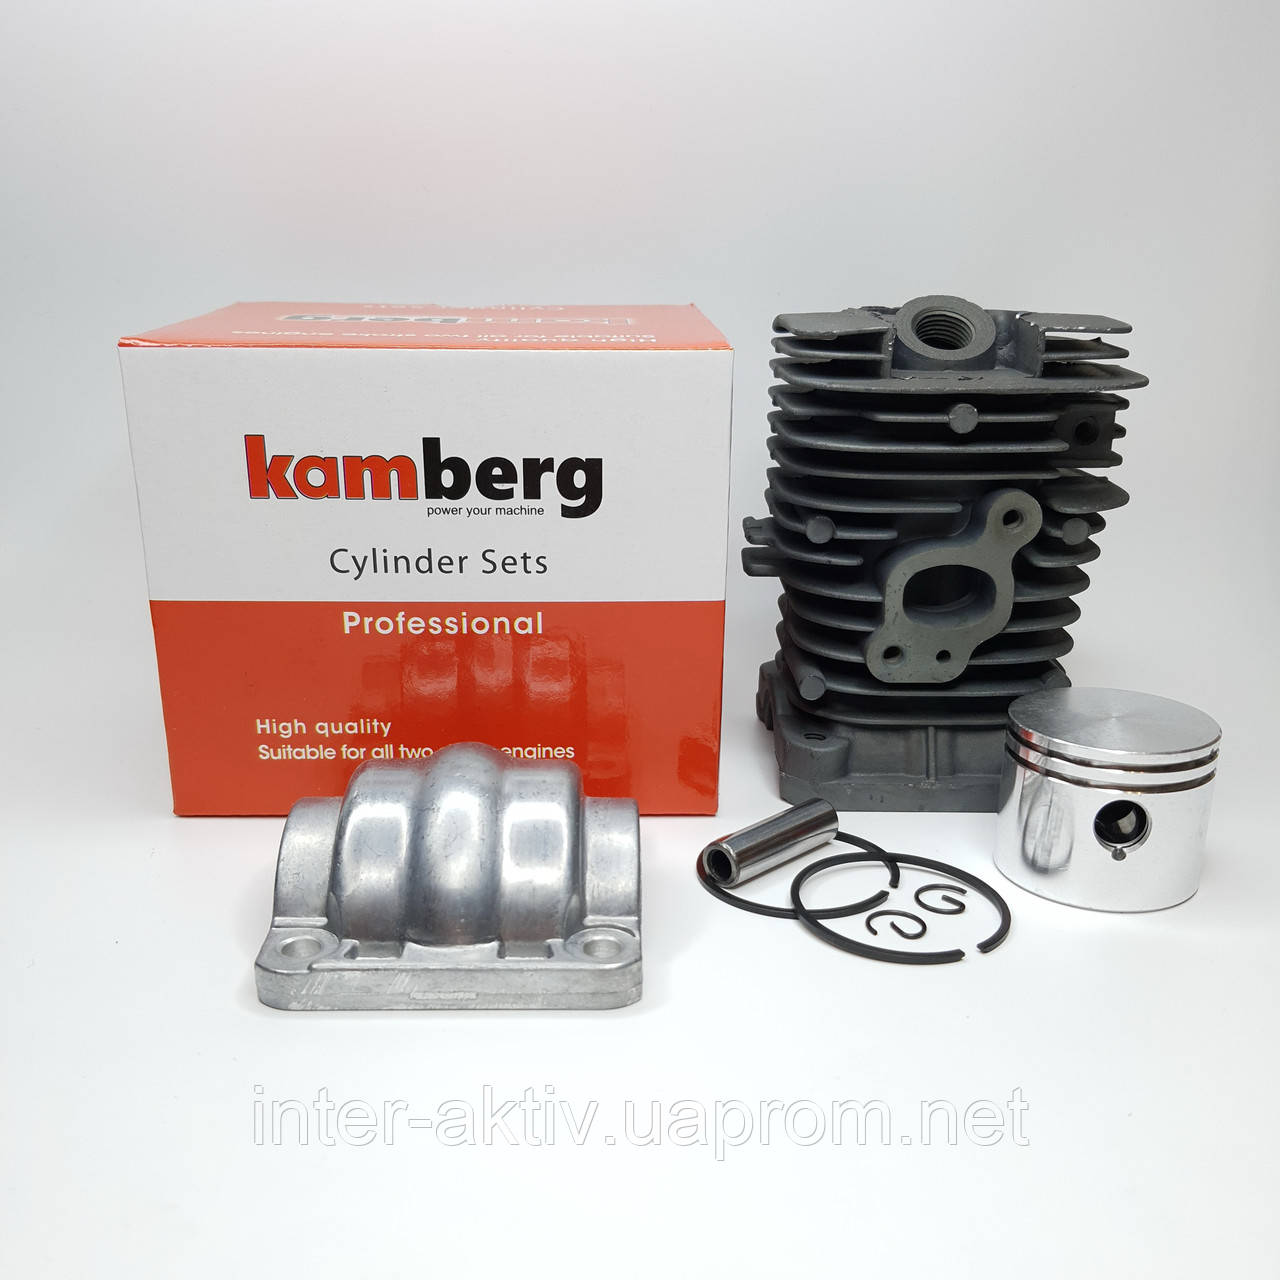 Поршневая для бензопилы Partner 350 Kamberg